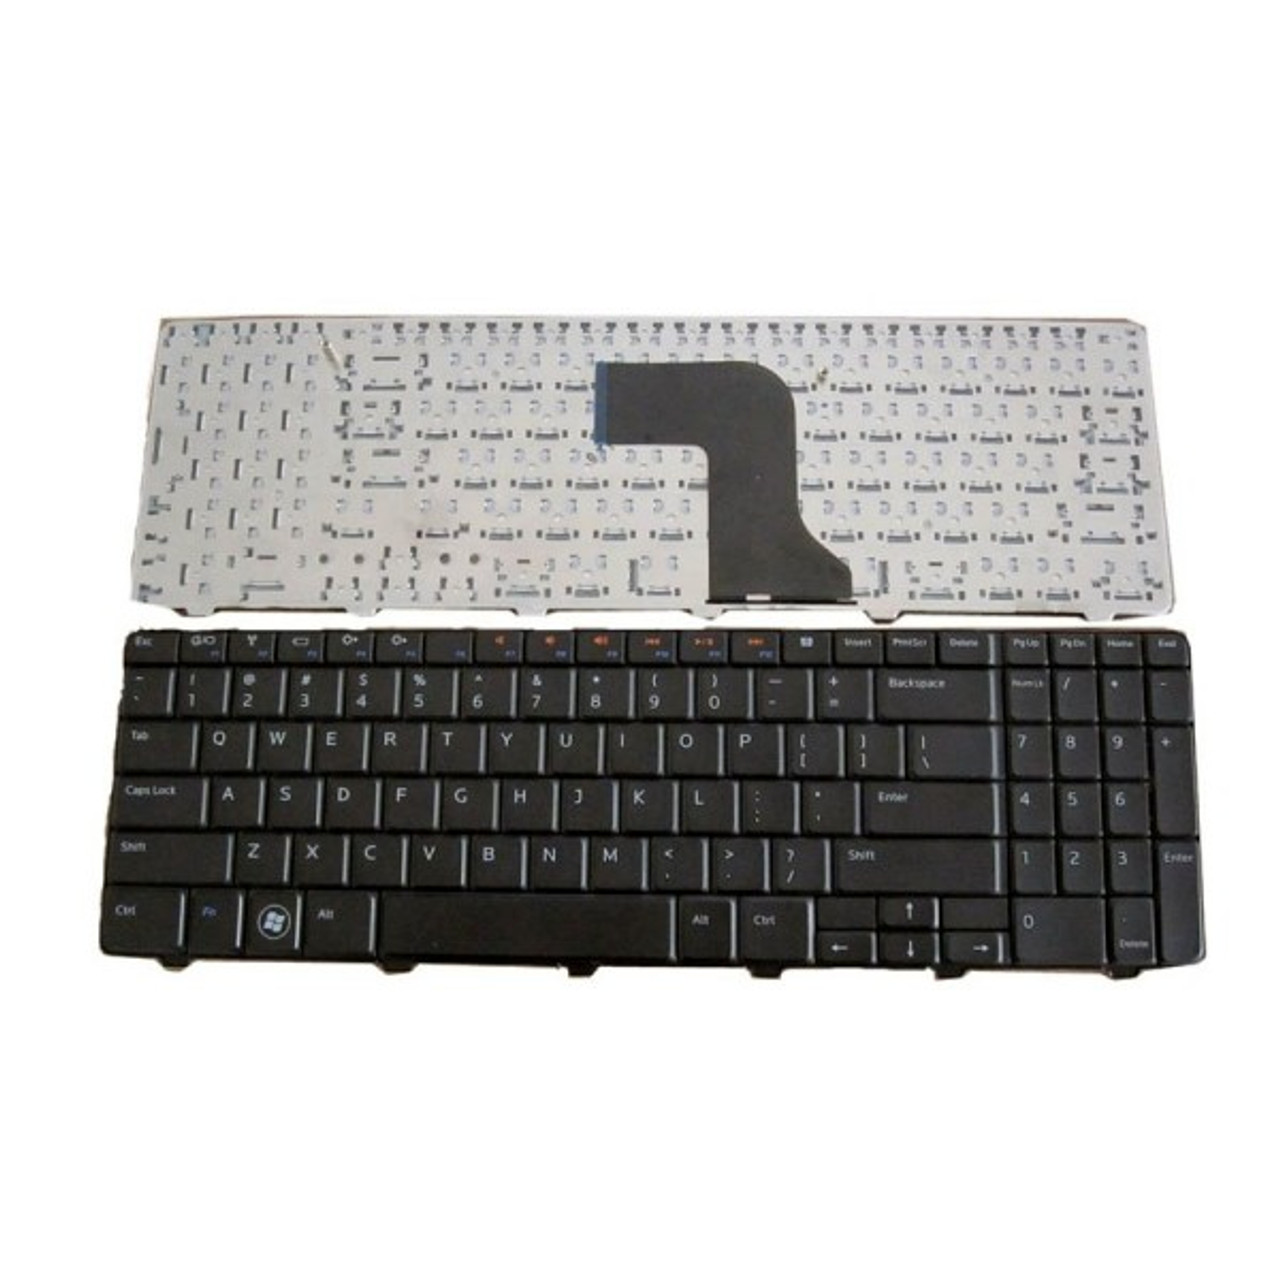 Dell Inspiron N5010  M5010 Laptop Keyboard - 9GT99